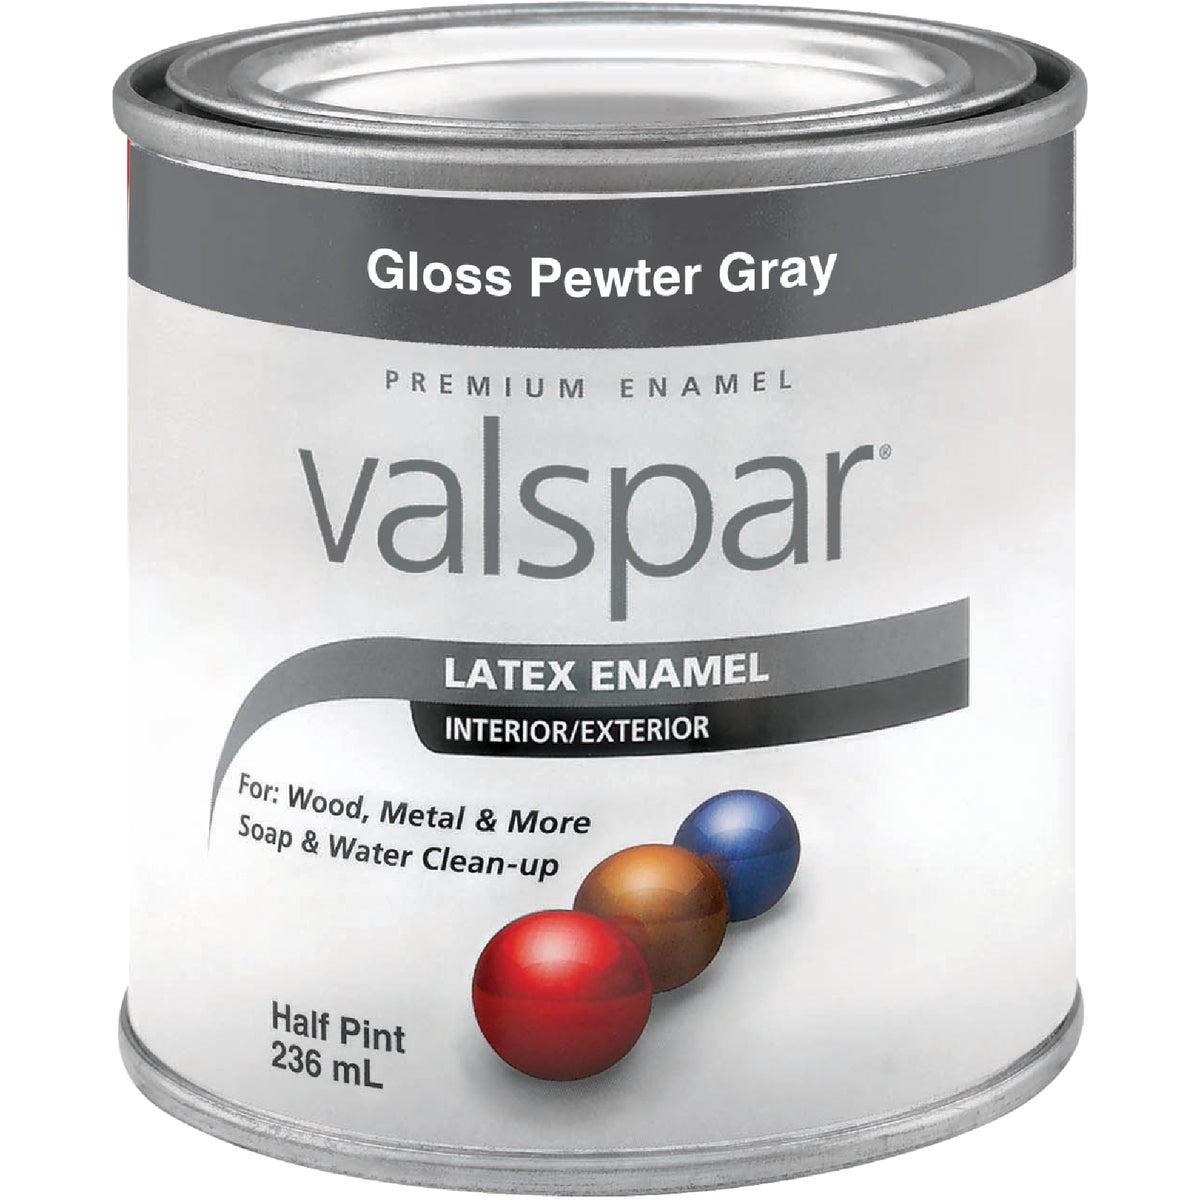 LTX GRAY ENAMEL - 410.0065039.003 by Valspar Corp